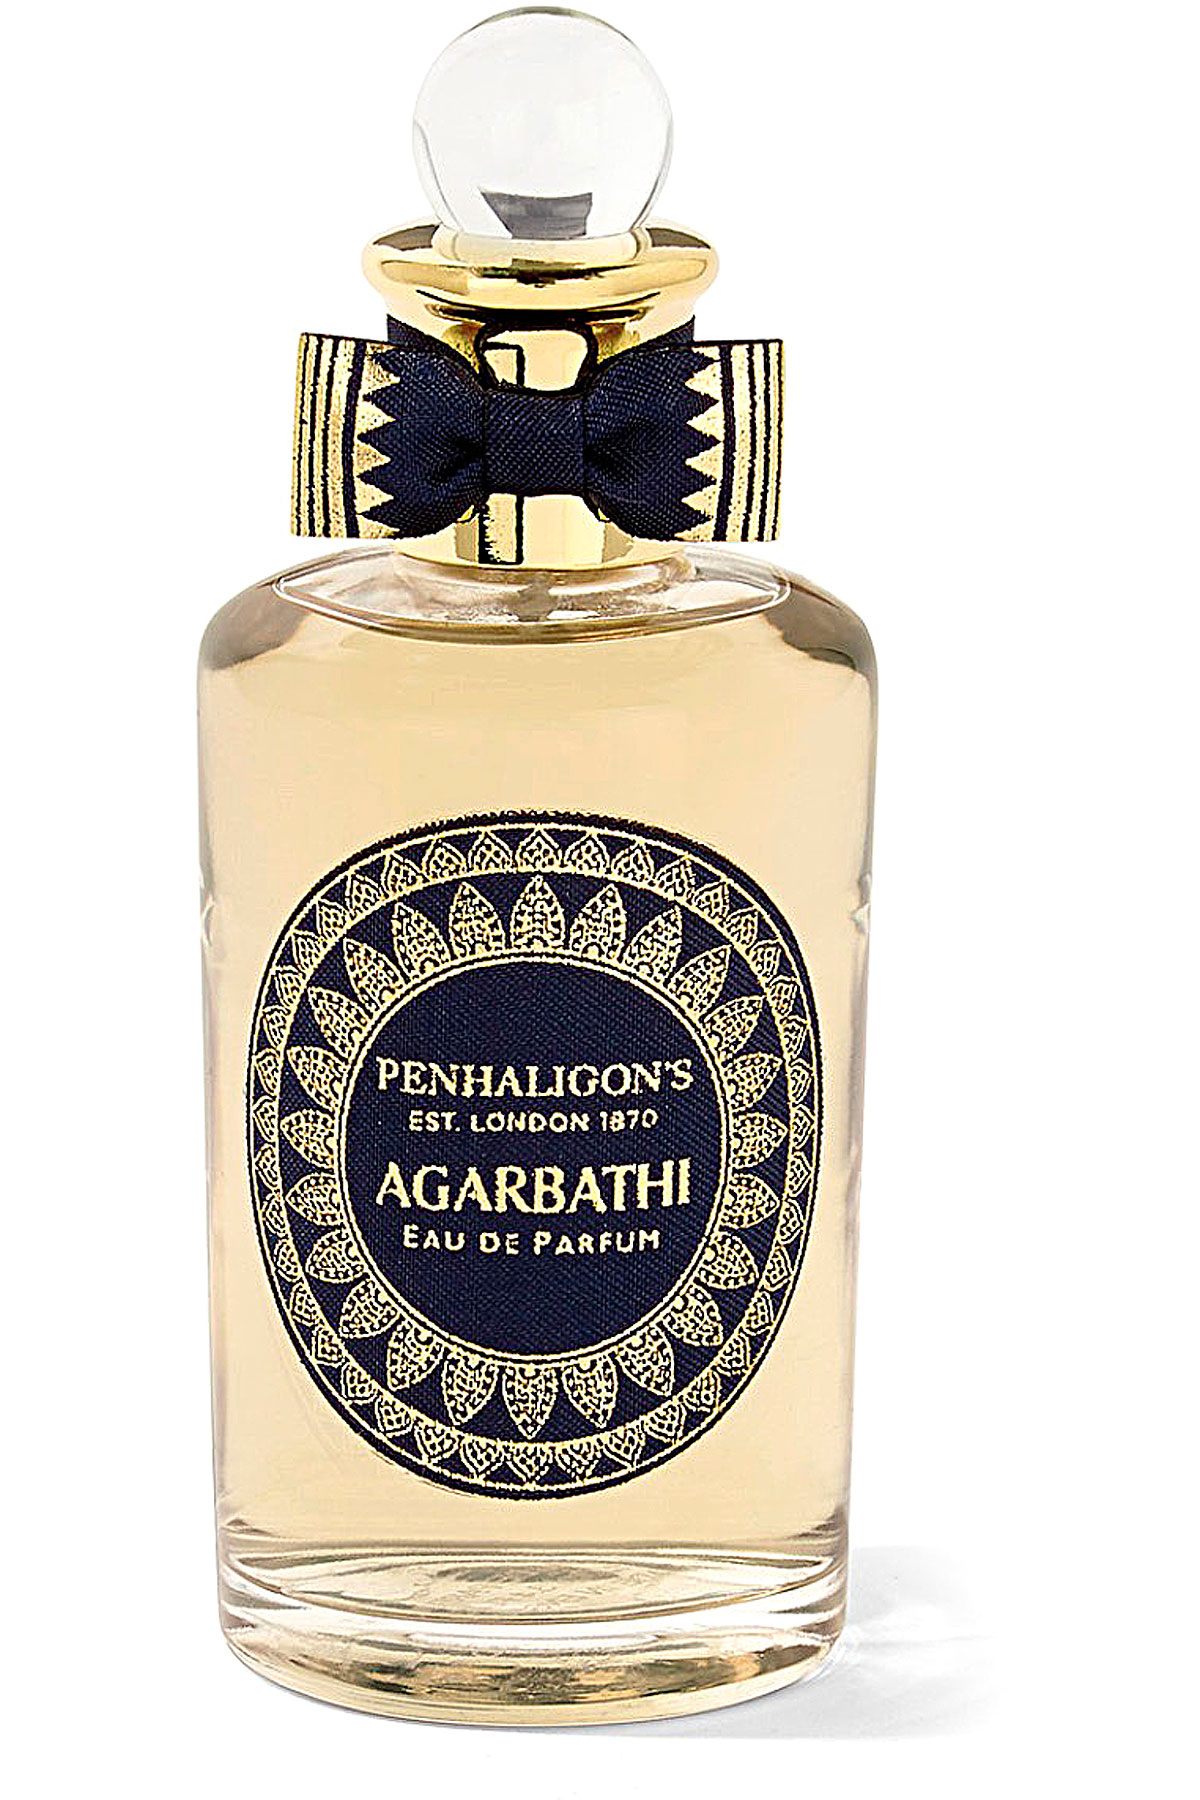 Penhaligon s London Fragrances for Men, Agarbathi - Eau De Parfum - 100 Ml, 2019, 100 ml